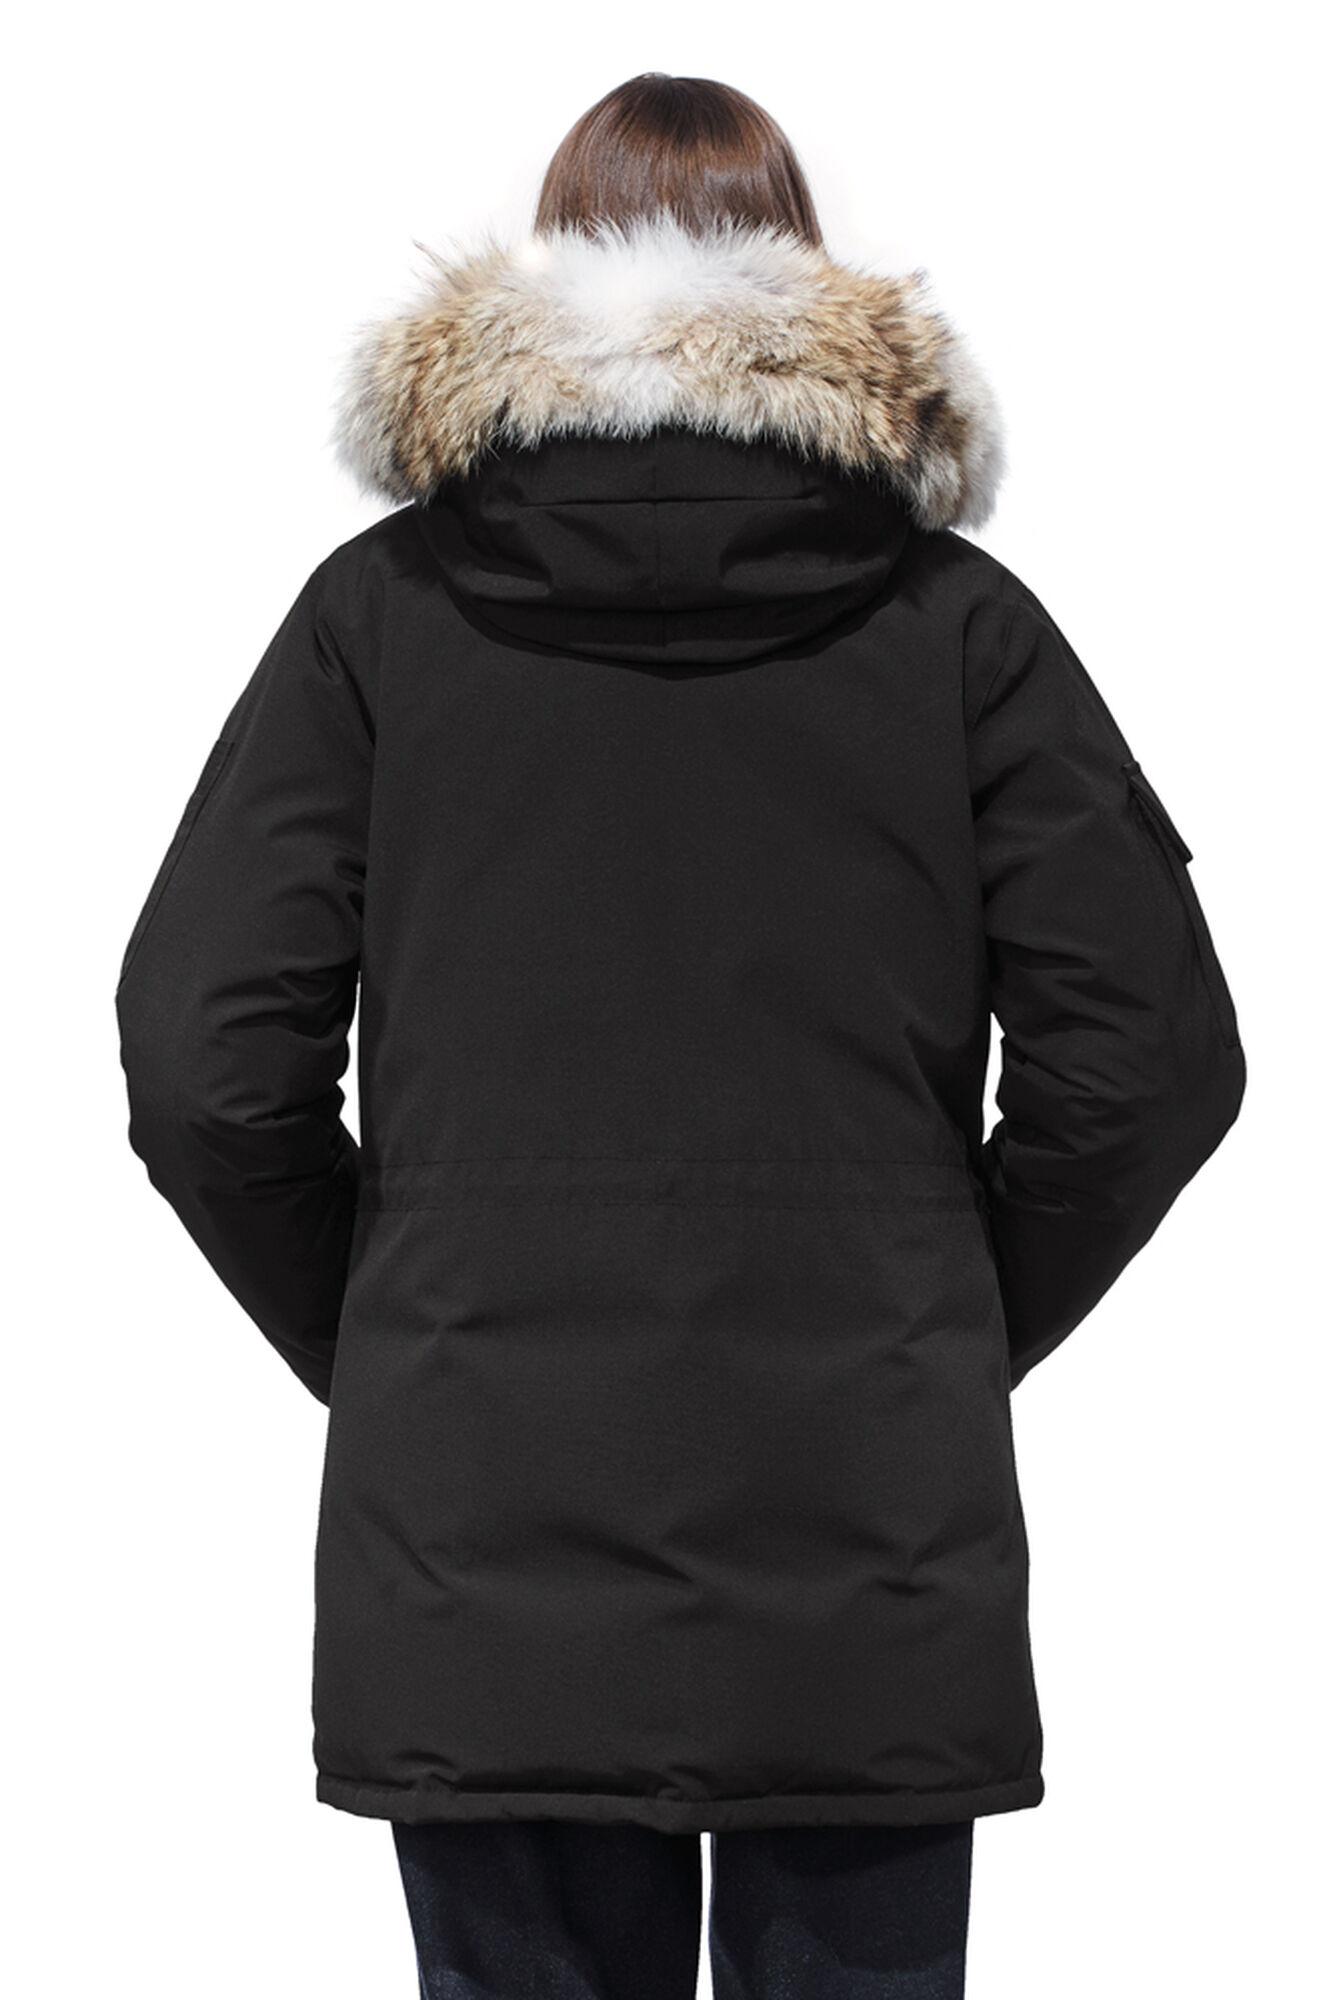 expedition parka women canada goose. Black Bedroom Furniture Sets. Home Design Ideas